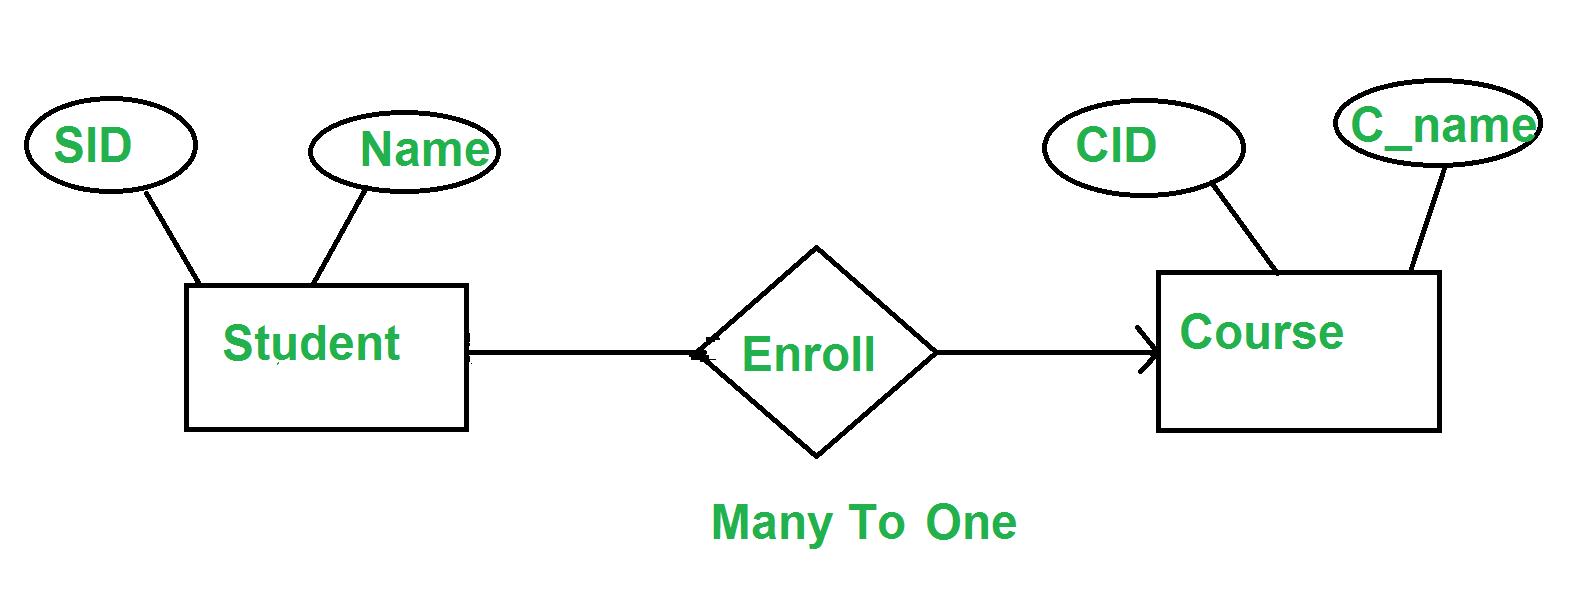 Minimization Of Er Diagrams - Geeksforgeeks